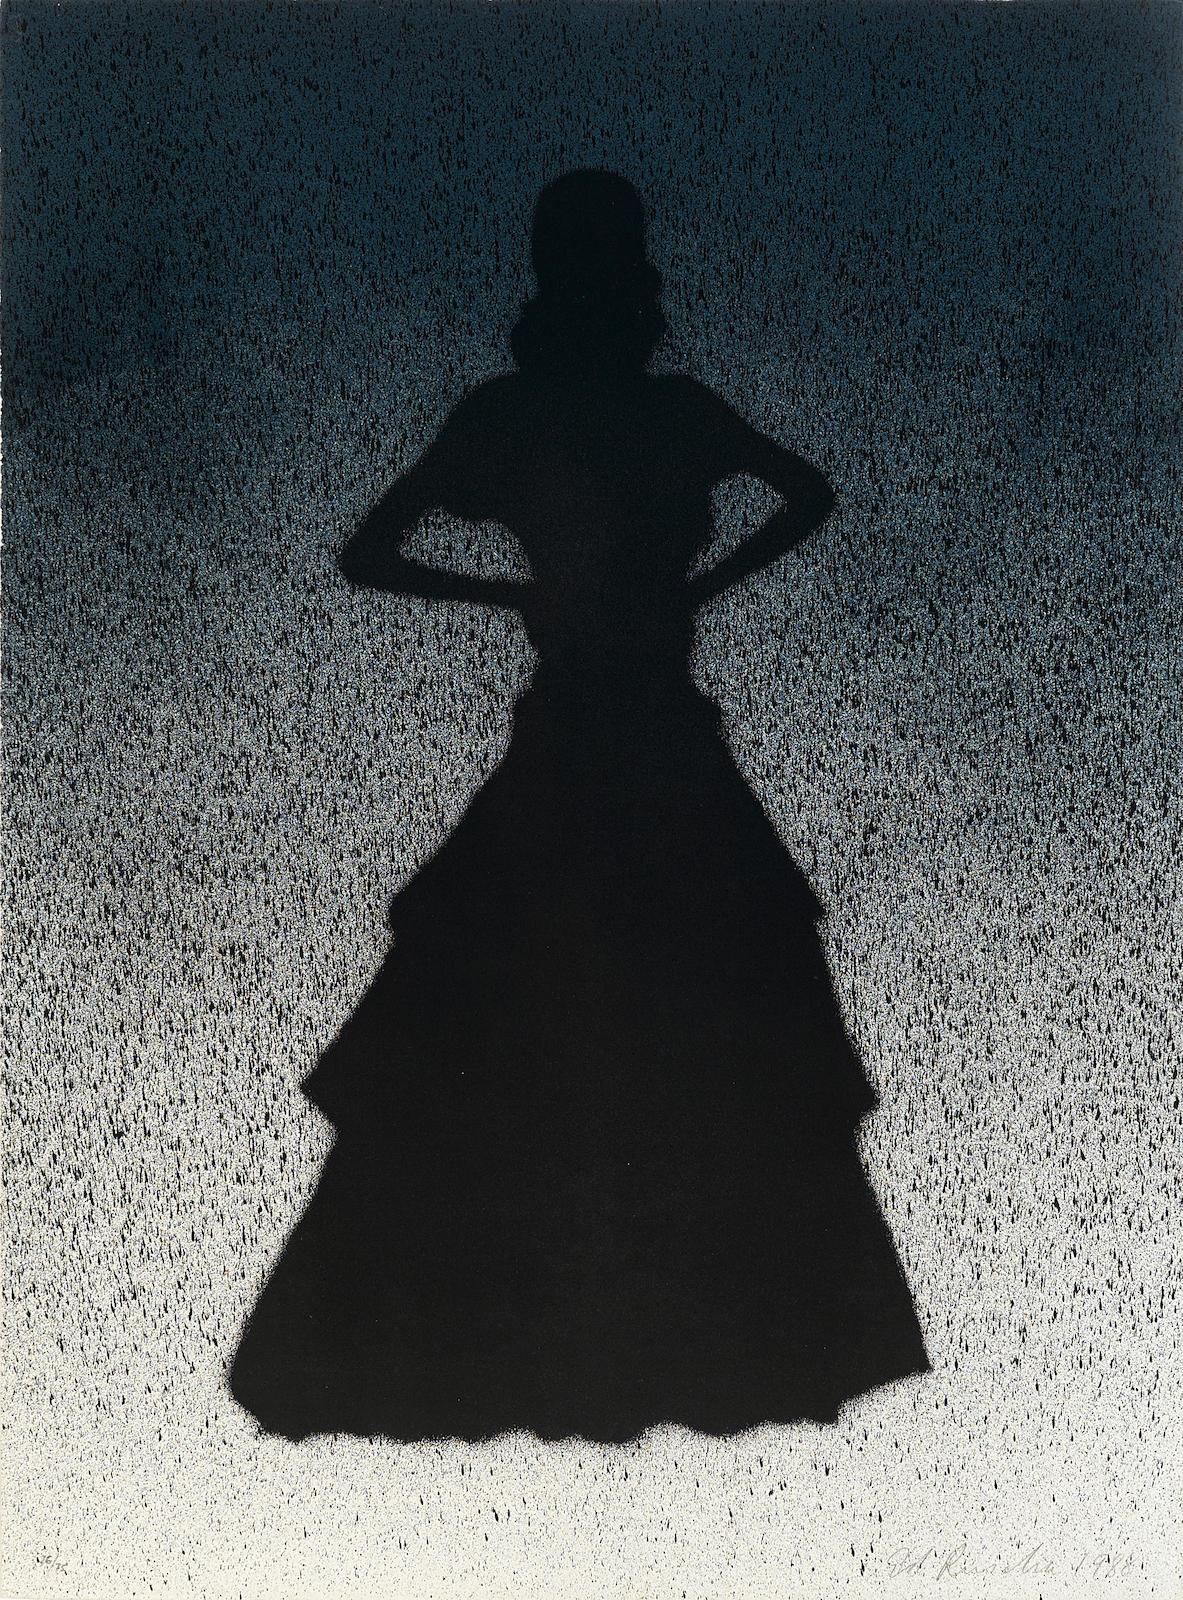 Ed Ruscha-Bailarina, from California Portfolio (E. 164)-1988